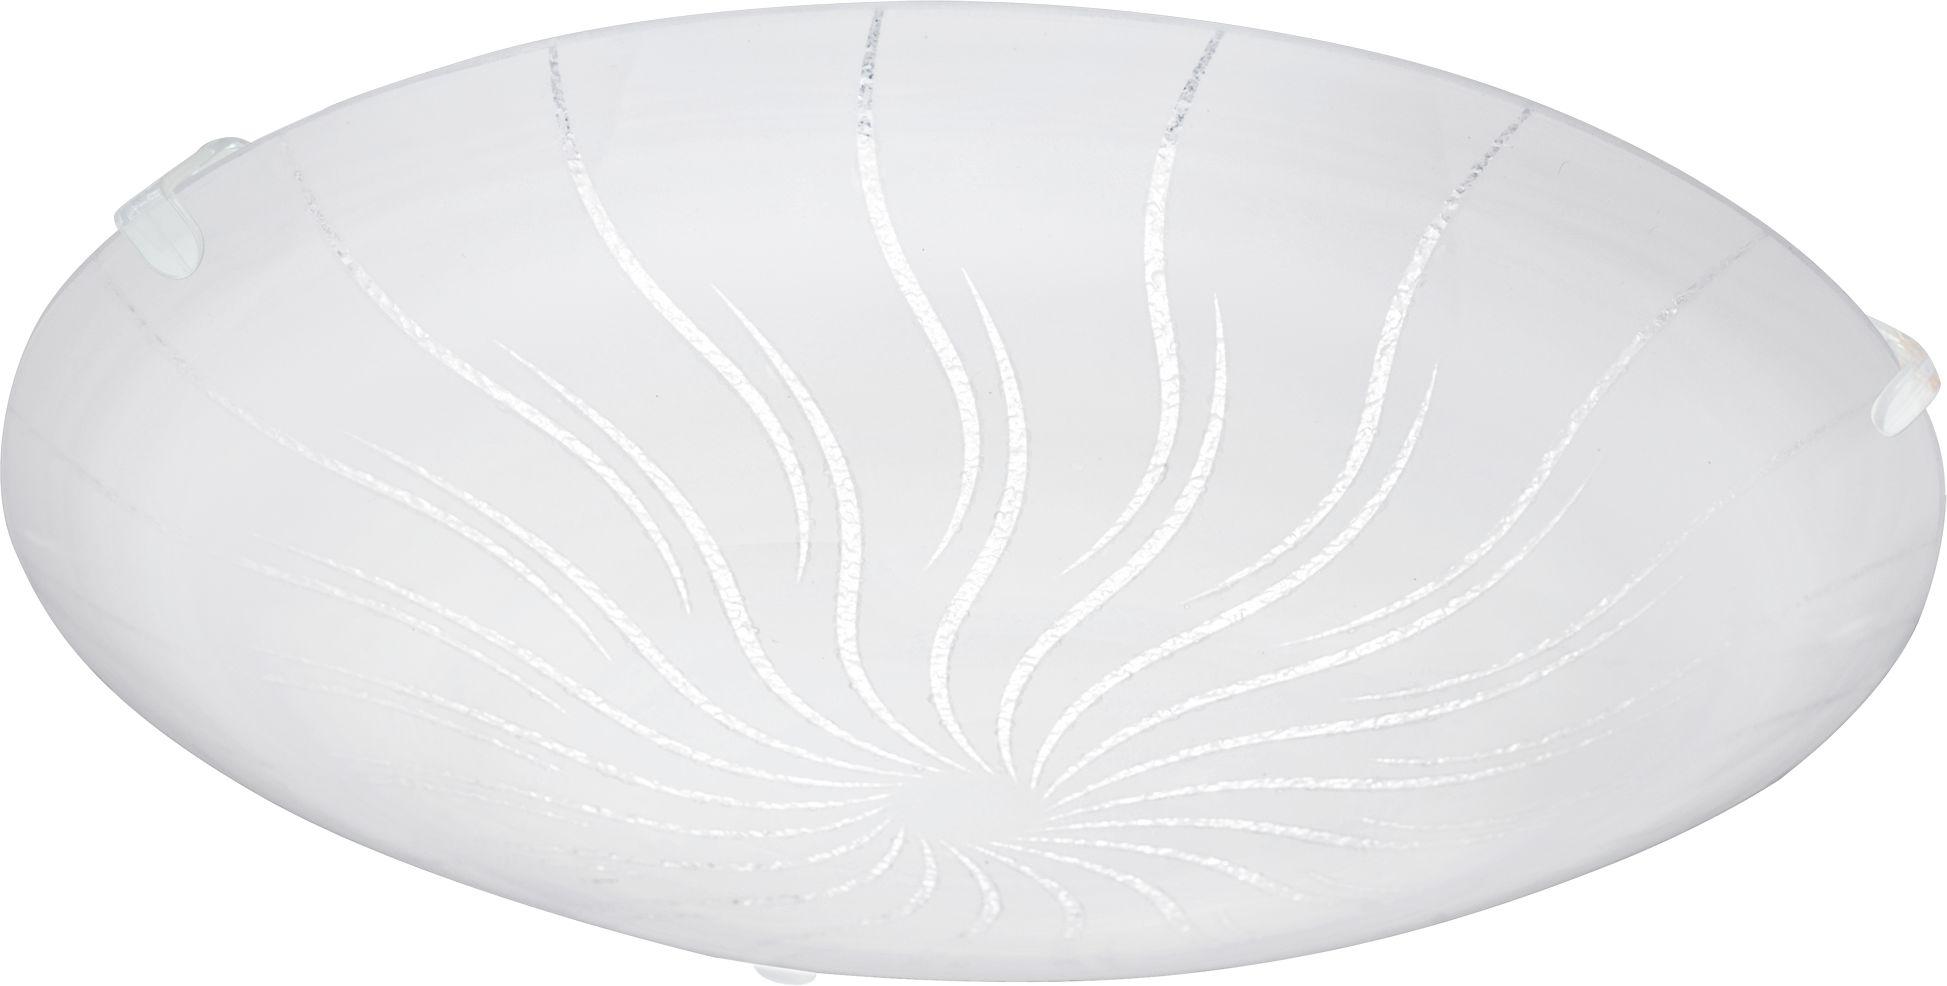 Eglo plafon LED Margitta 1 96089 - SUPER OFERTA - RABAT w koszyku